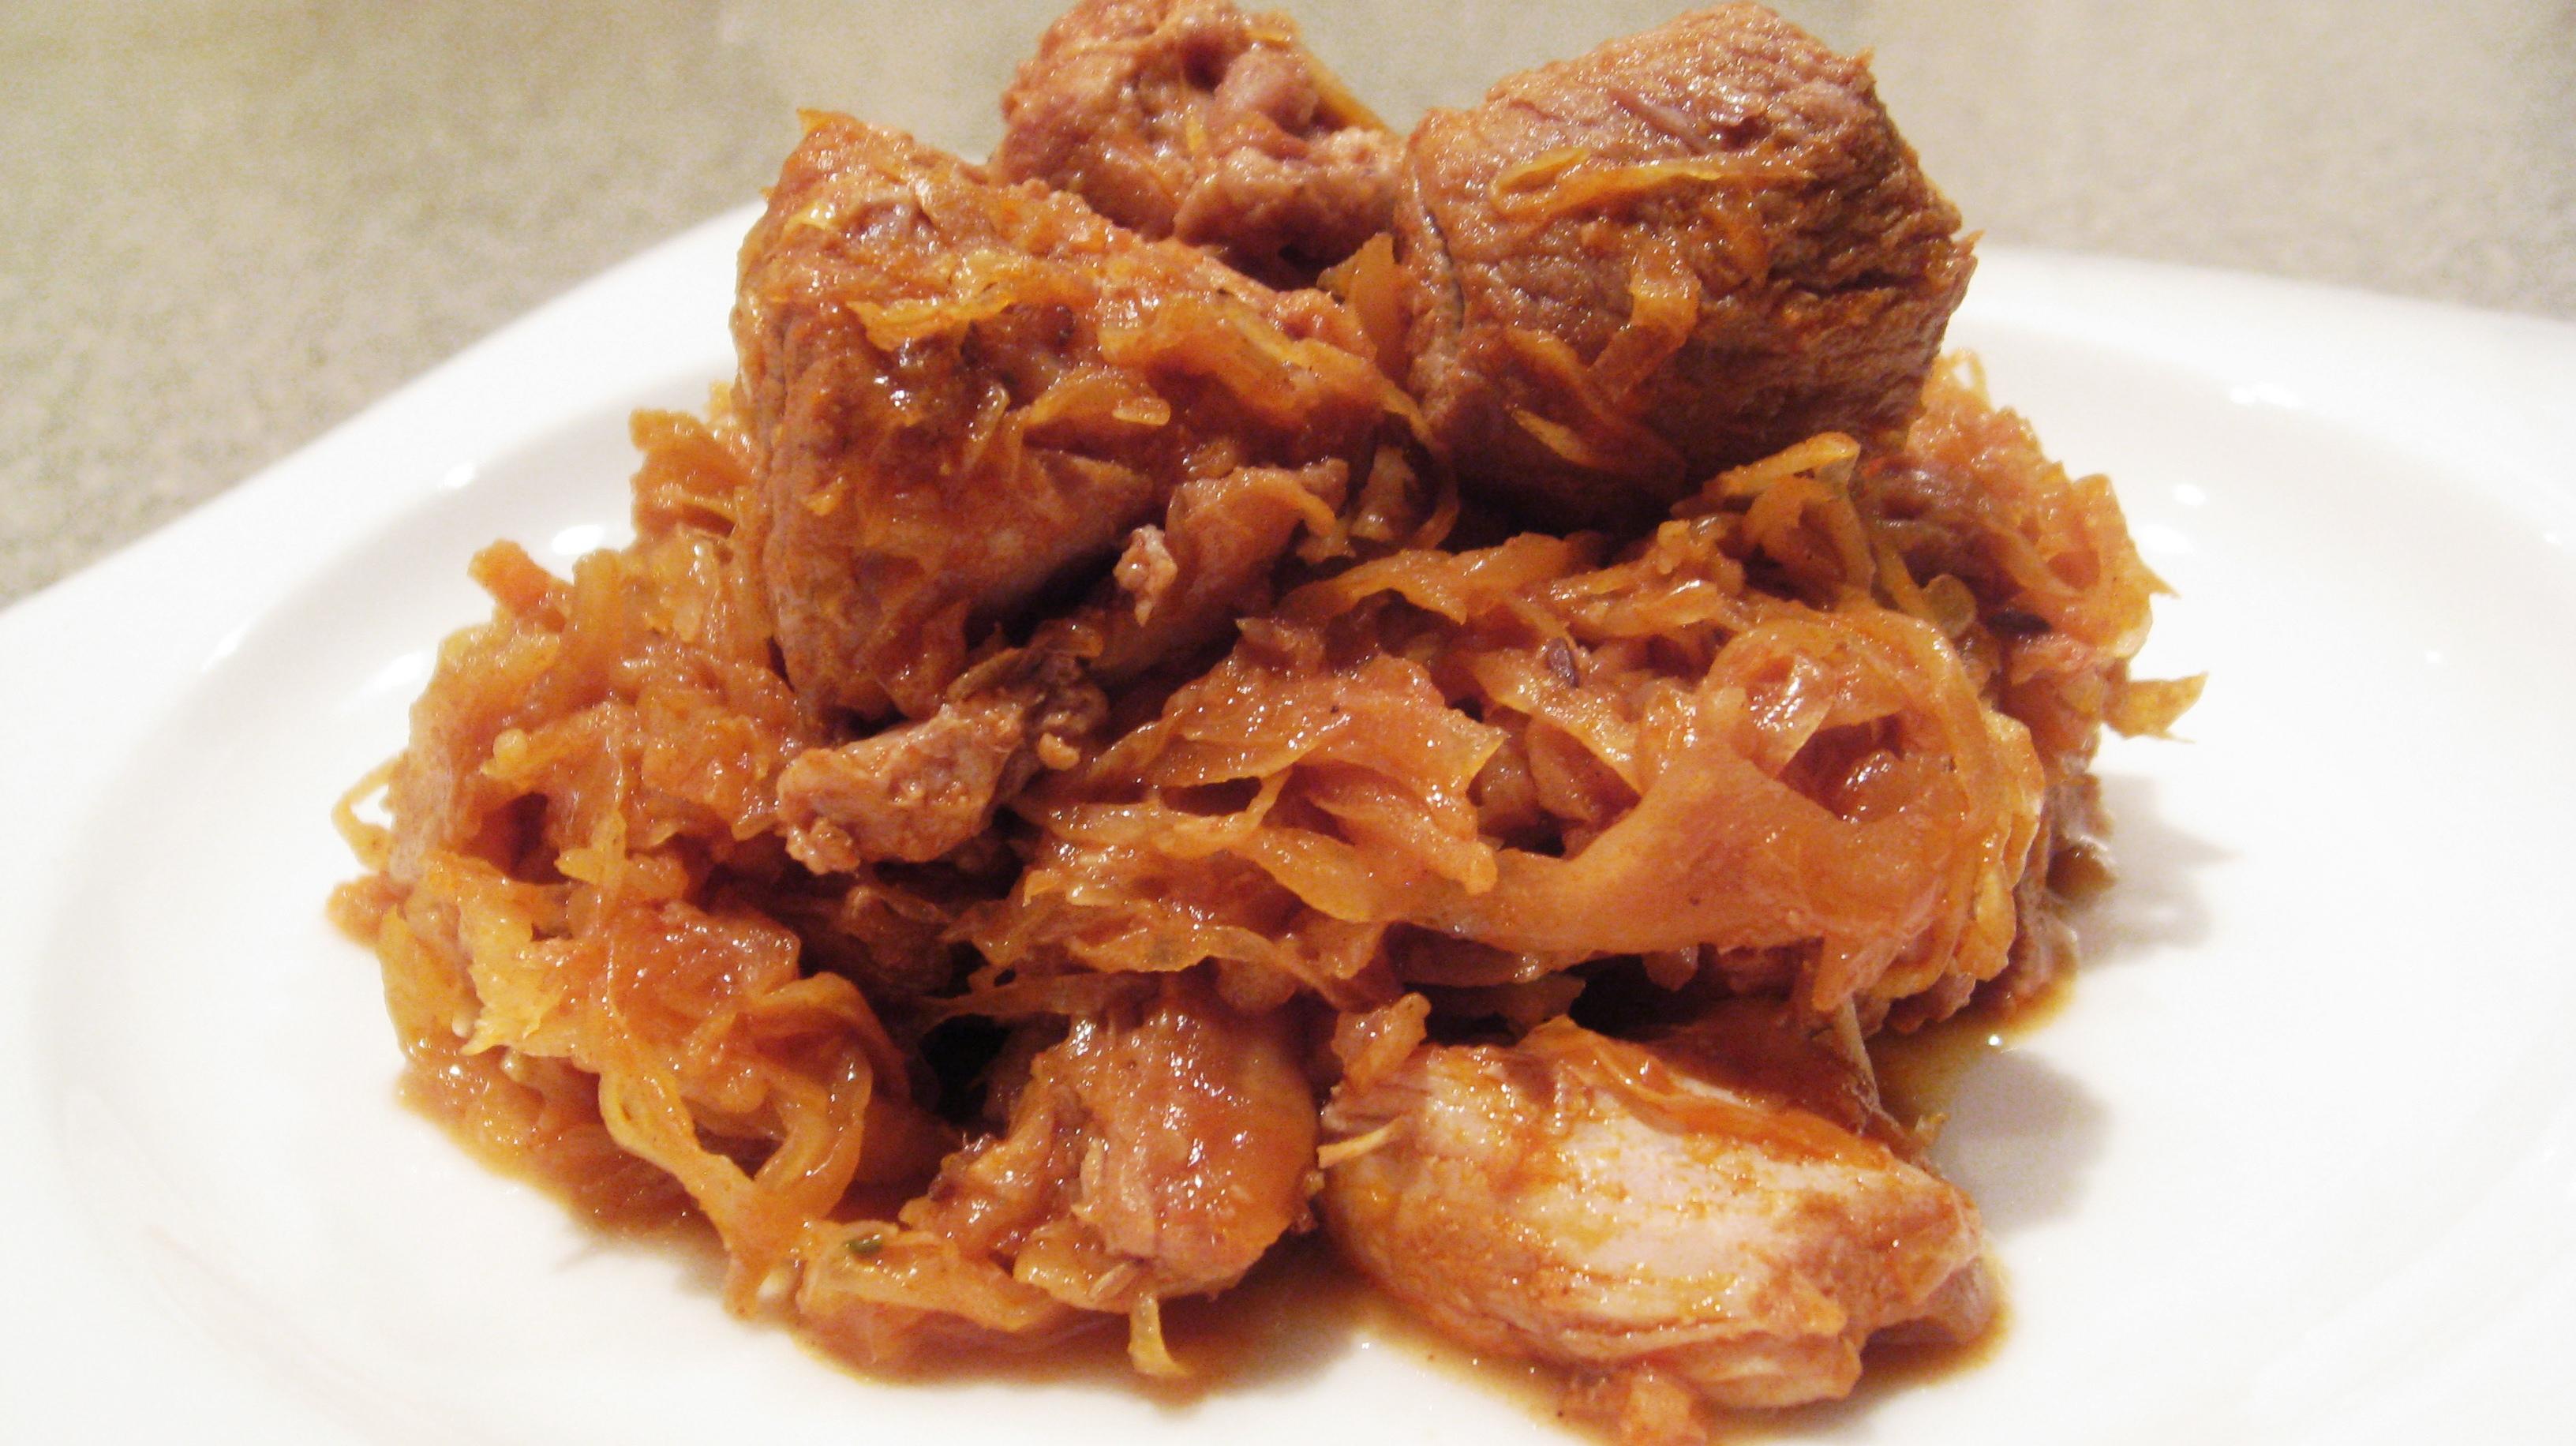 Sauerkraut and pork roast recipes